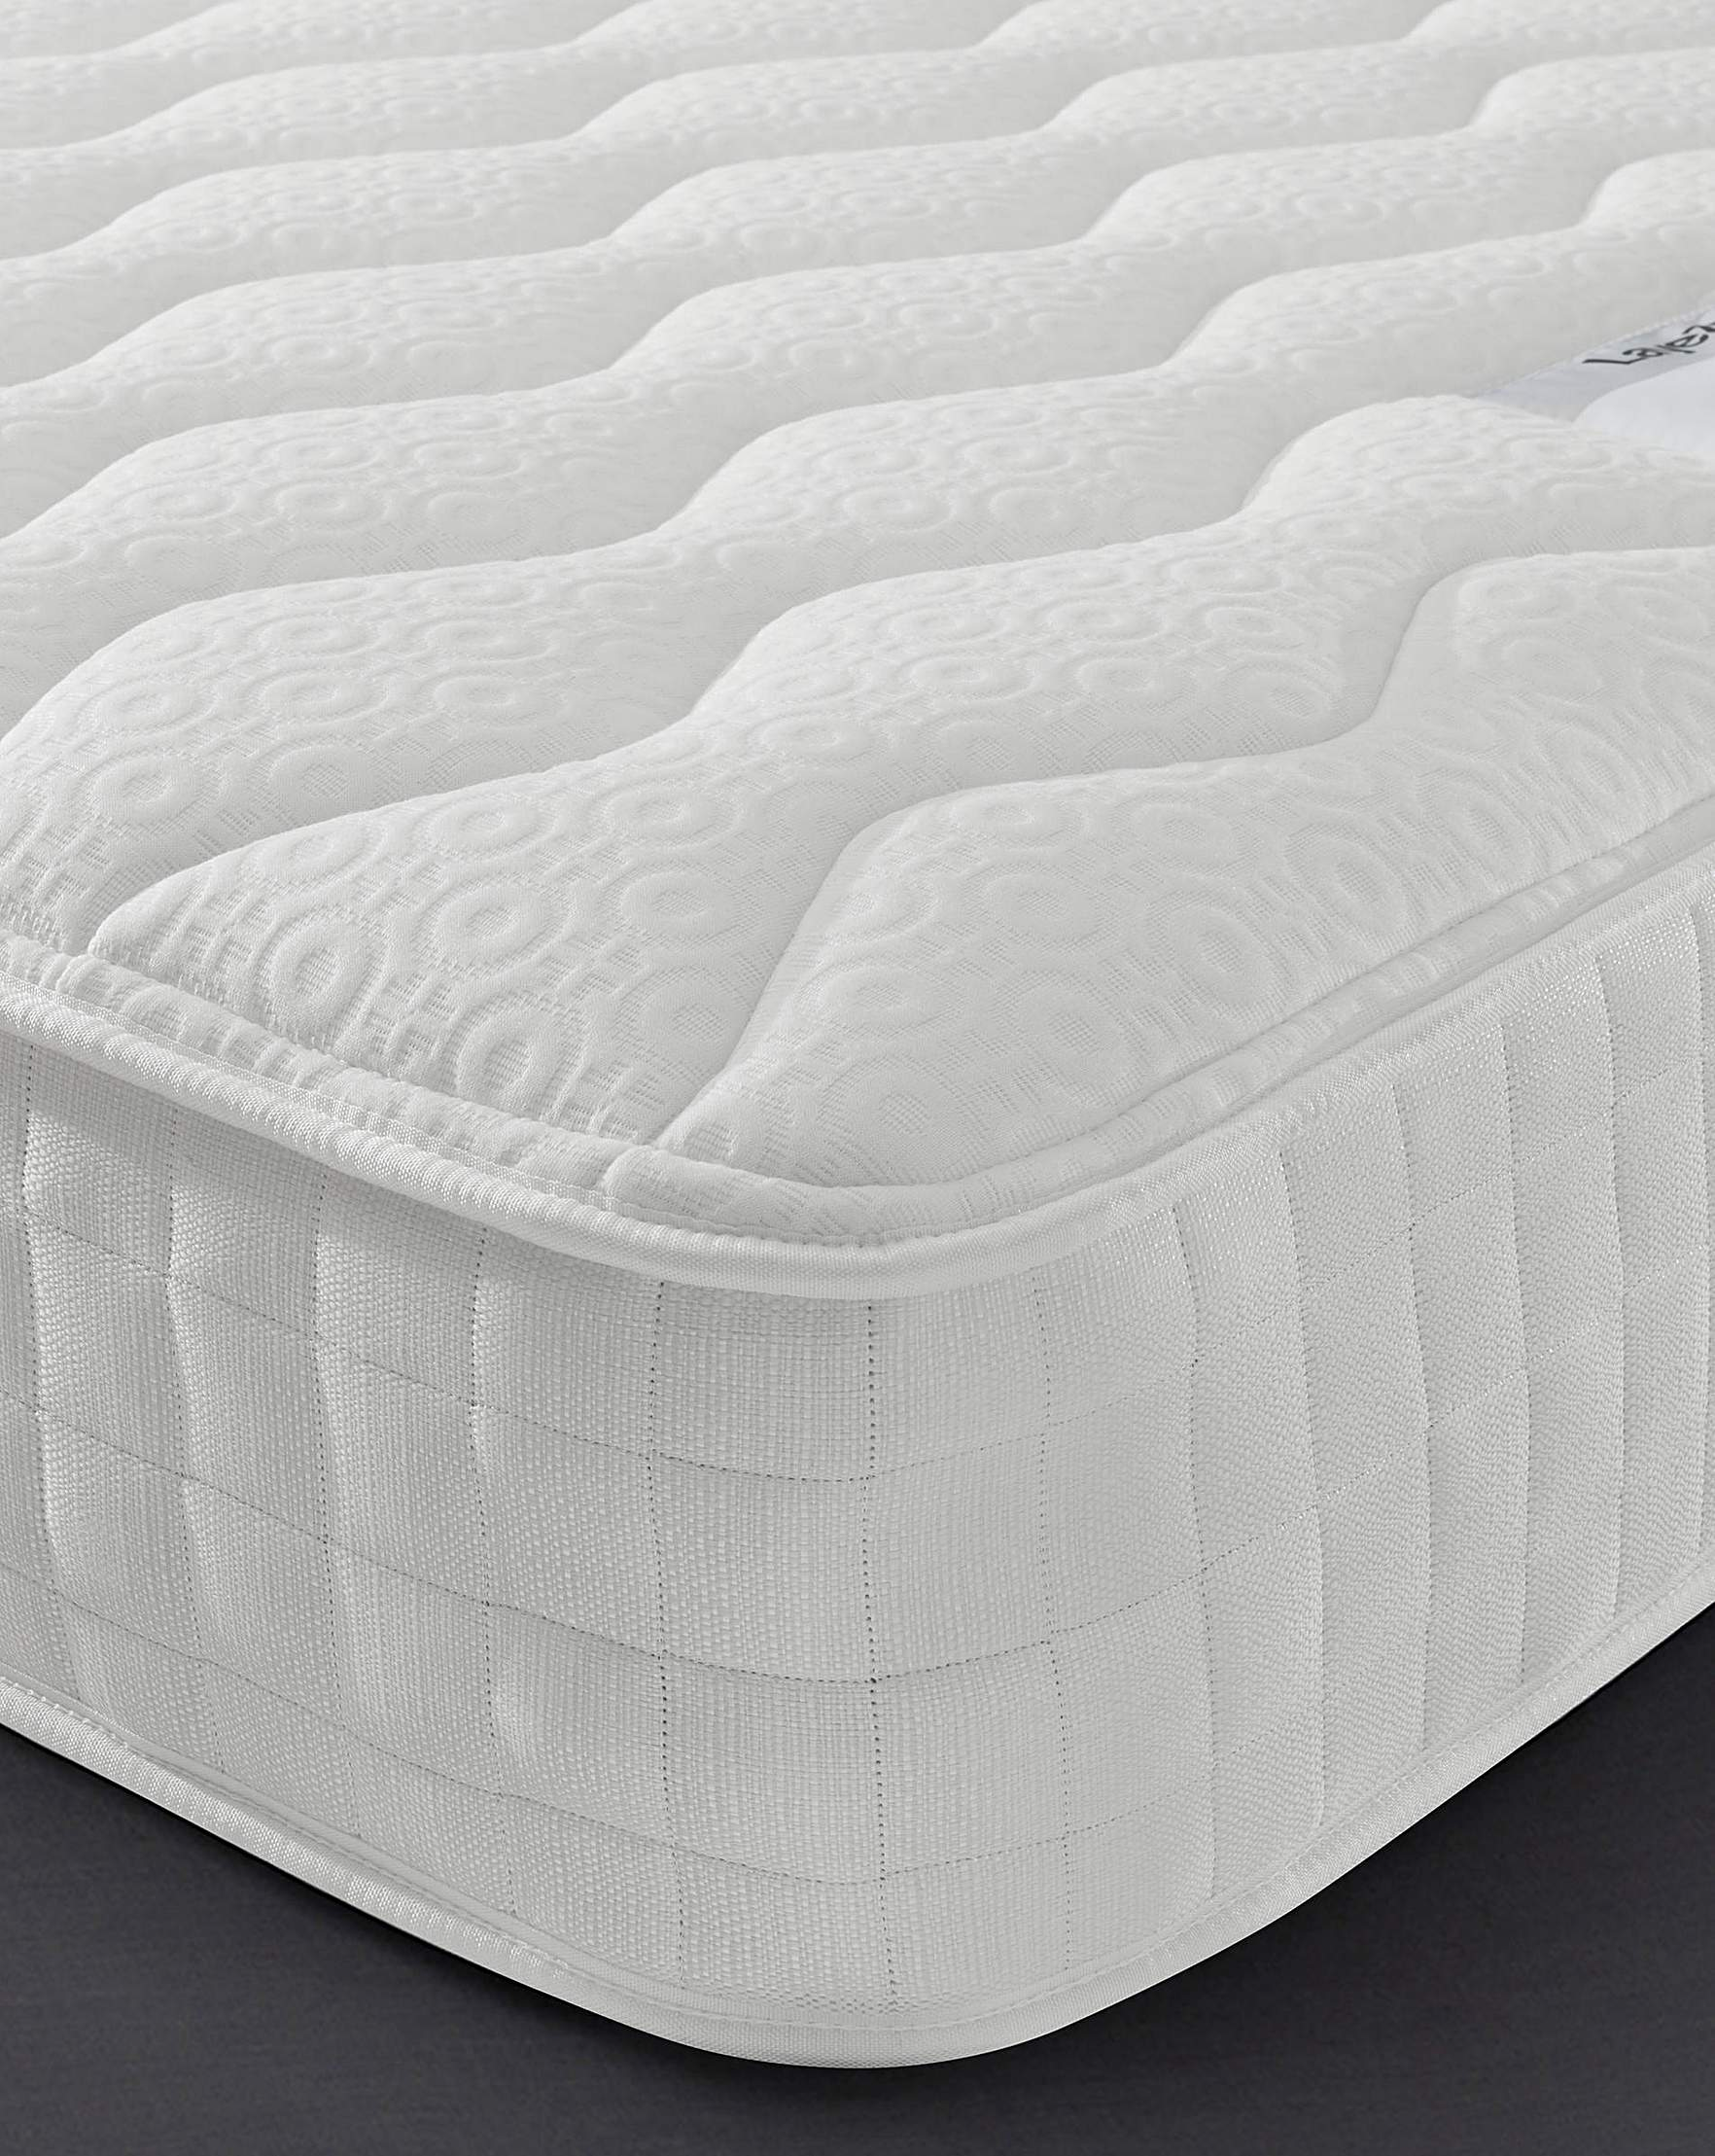 zi c wang collections dillards bedding white home mattress vera